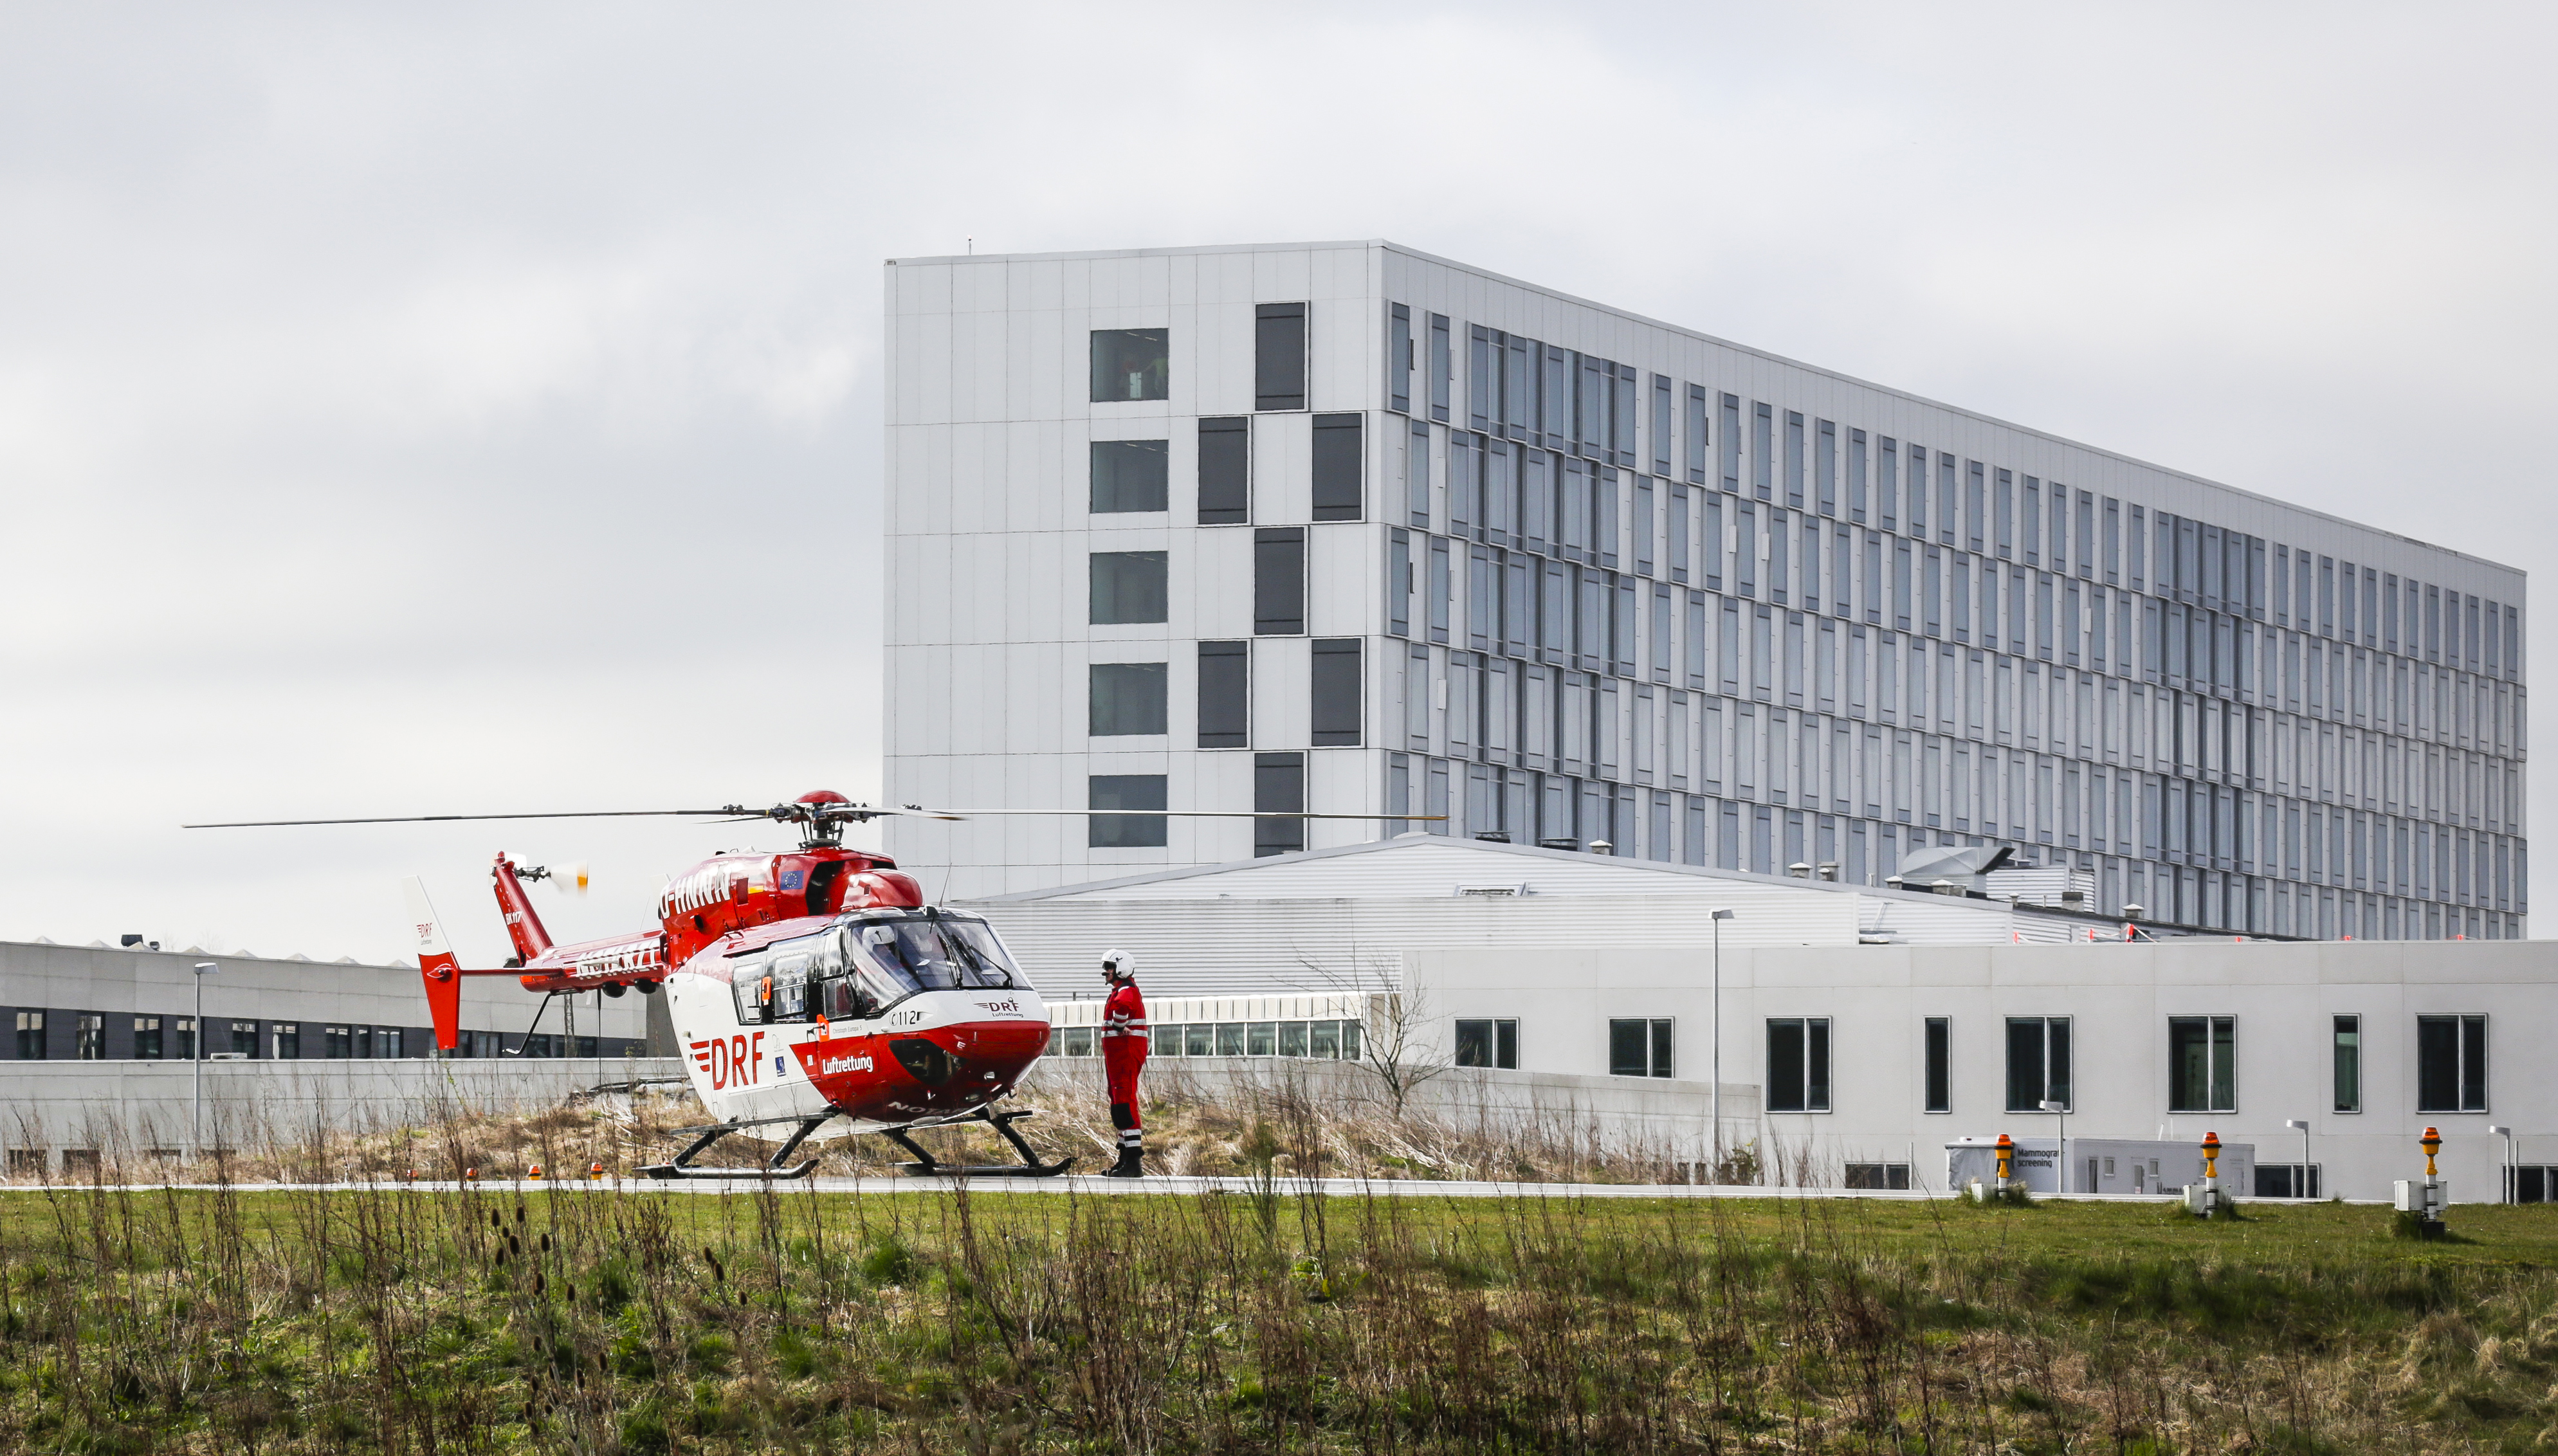 sygehus lillebælt middelfart